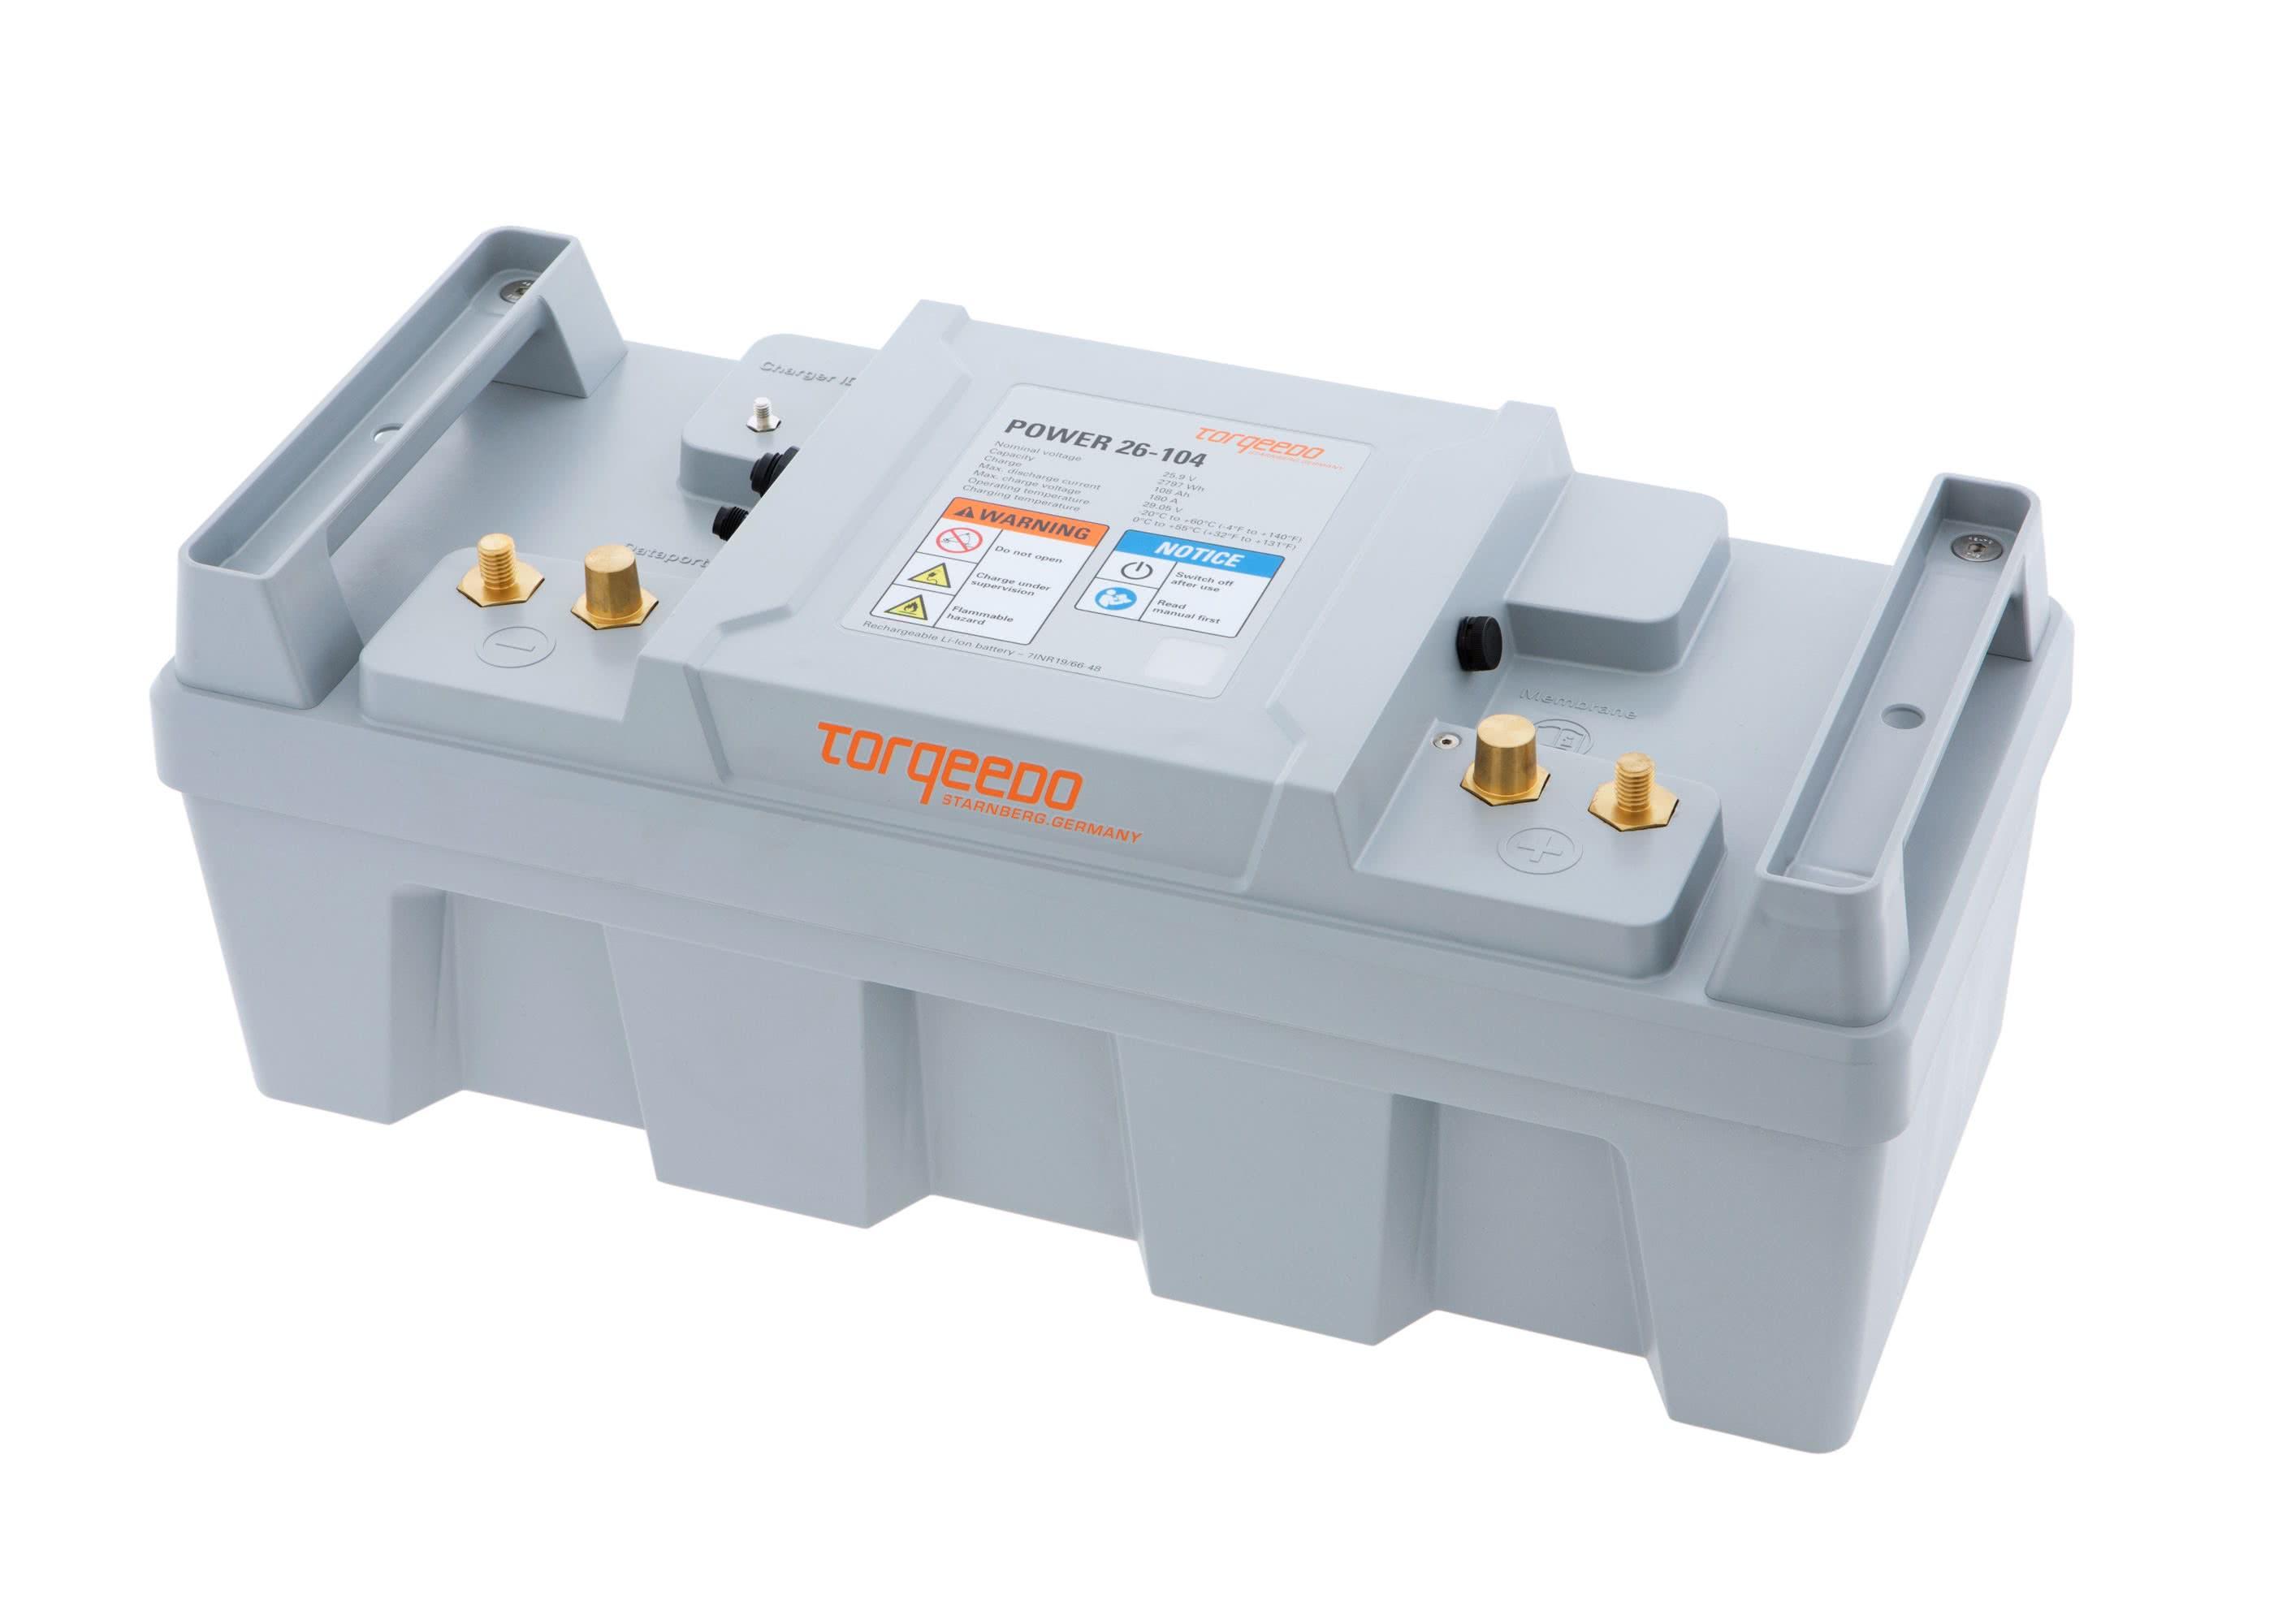 32990_Torqeedo_Hochleistungs_Lithium-Batterie_POWER26_104.jpg